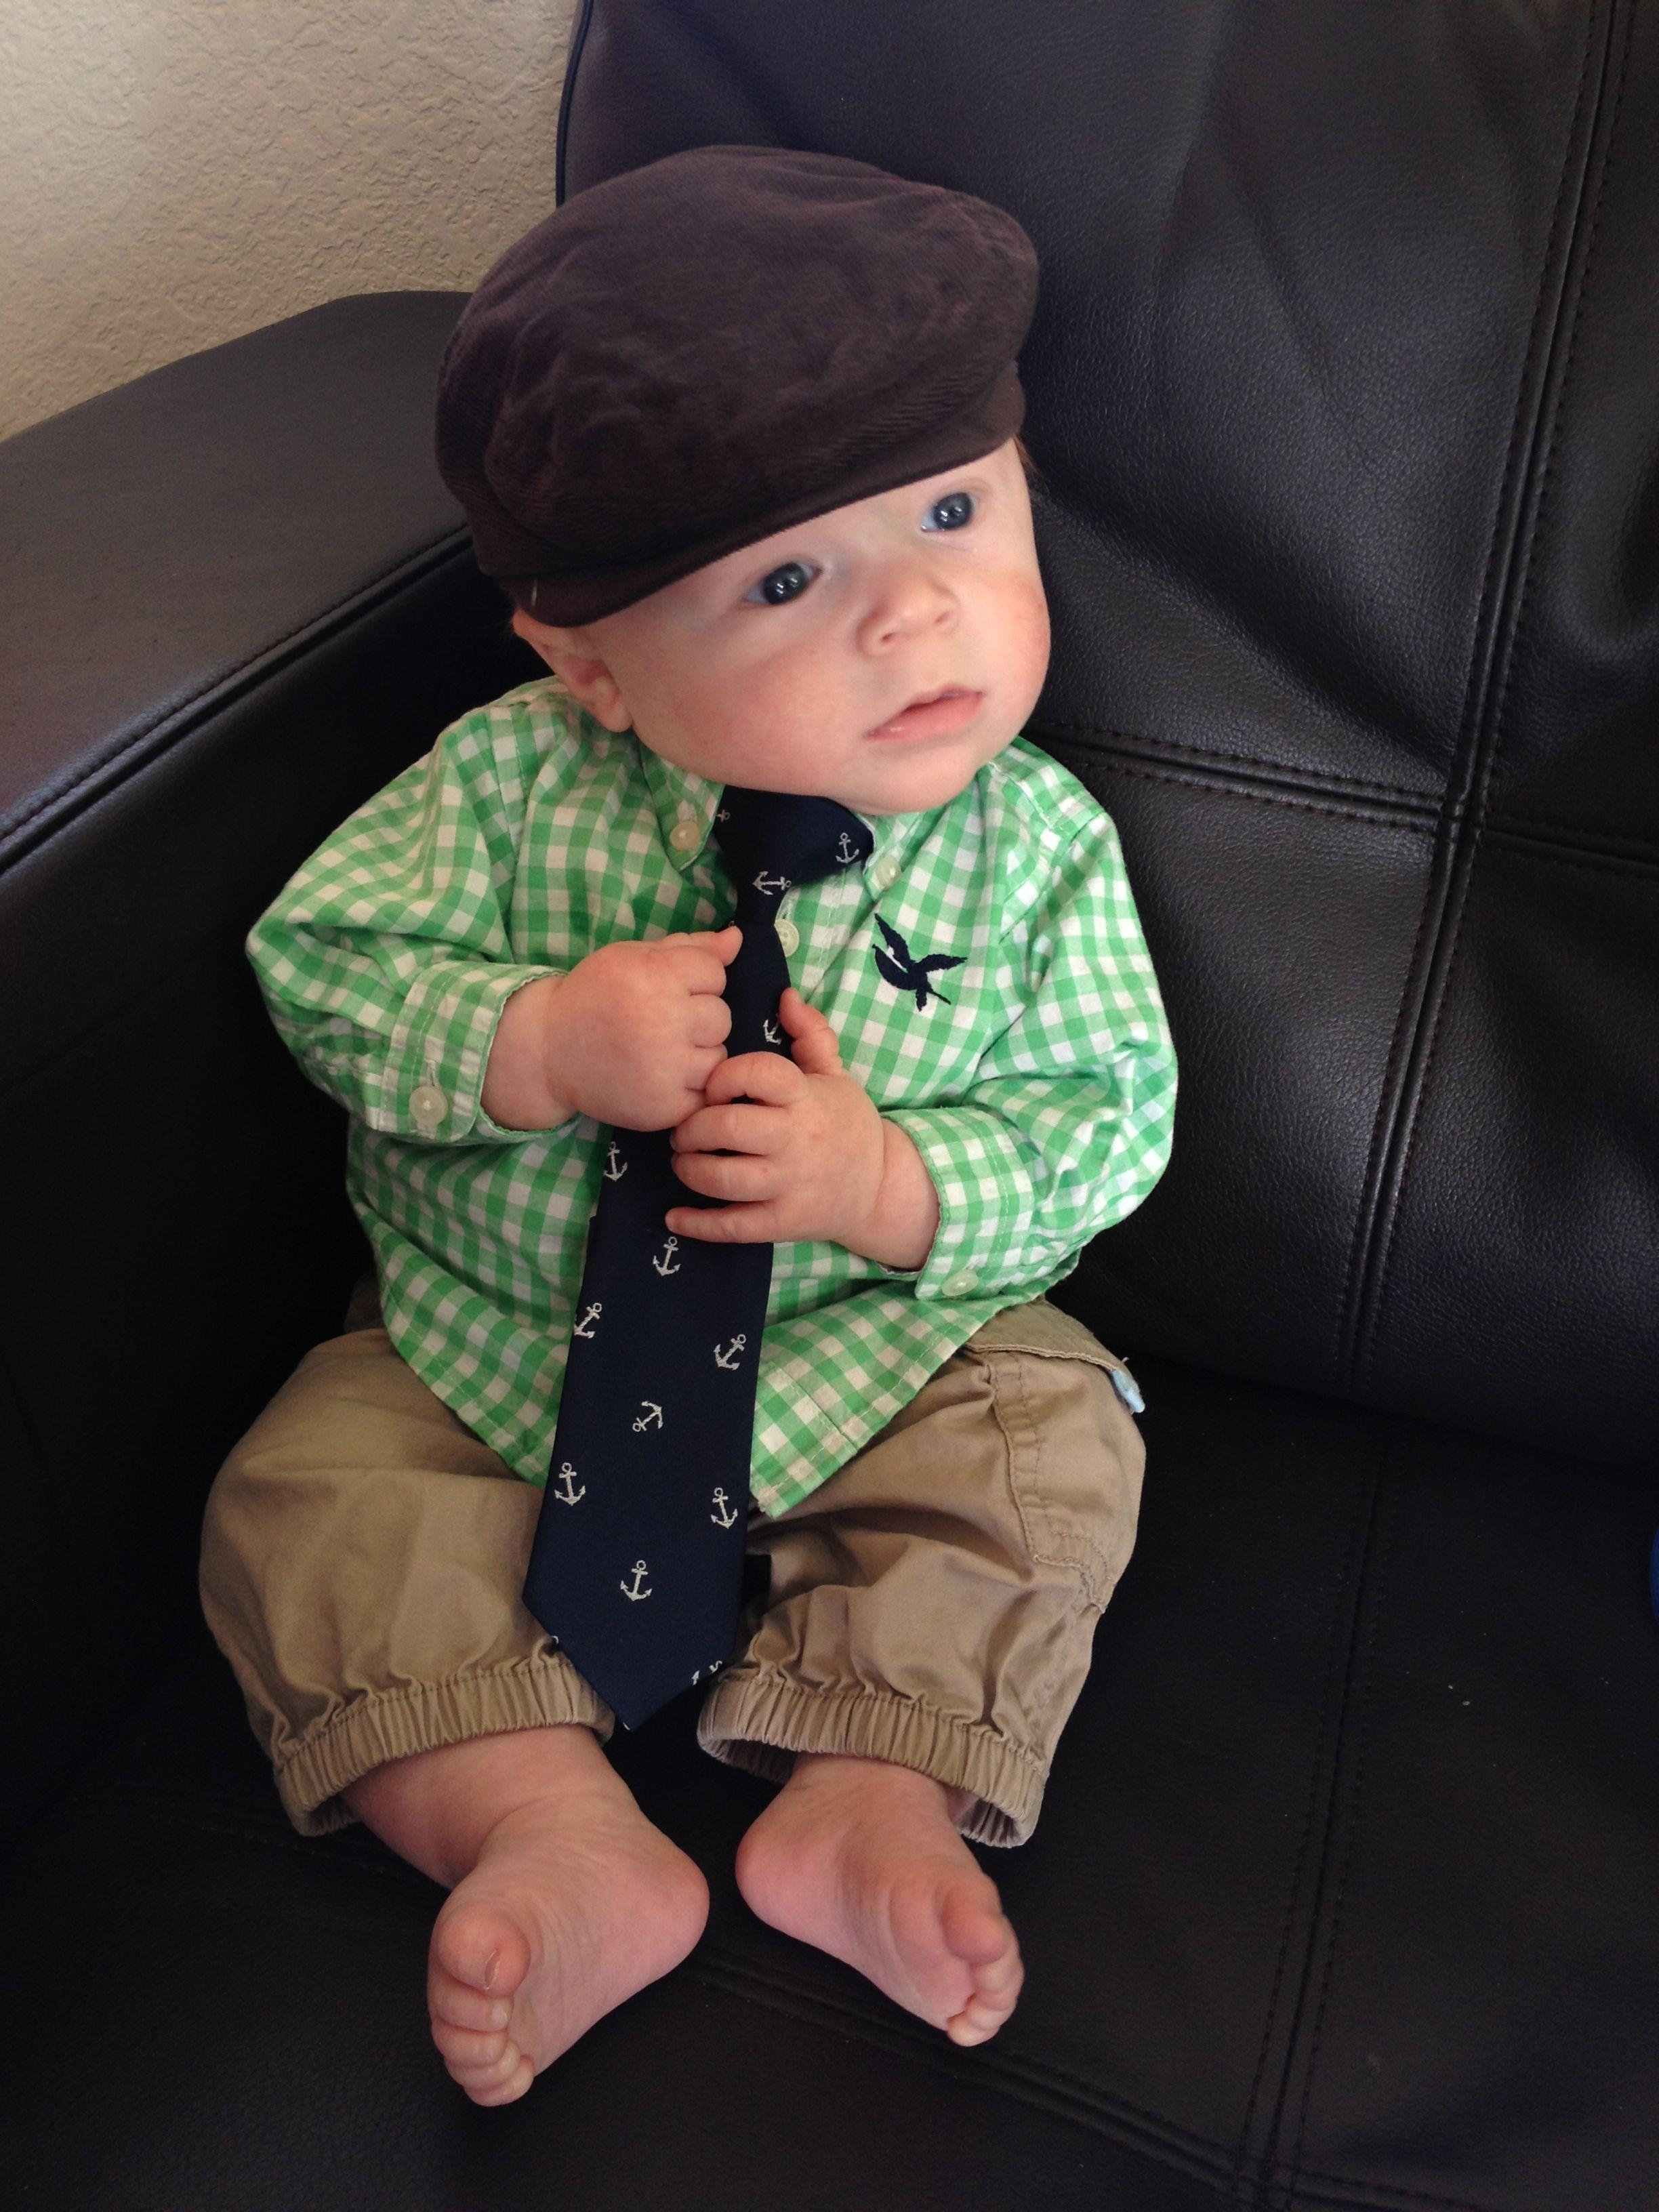 9396653b12cb Irish baby fashion - 4 months old boy